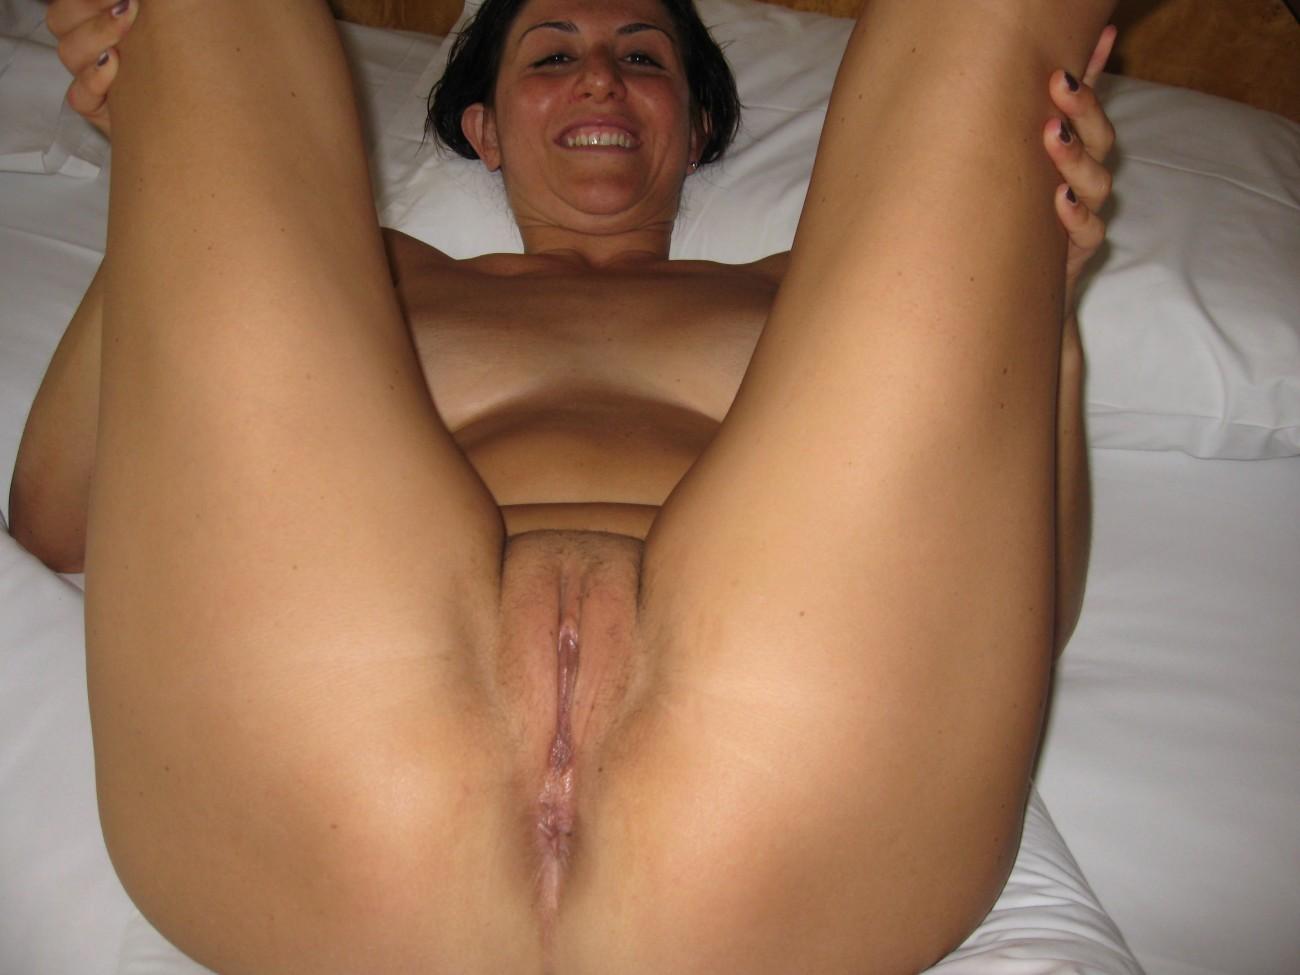 Adult friend finder porn pics